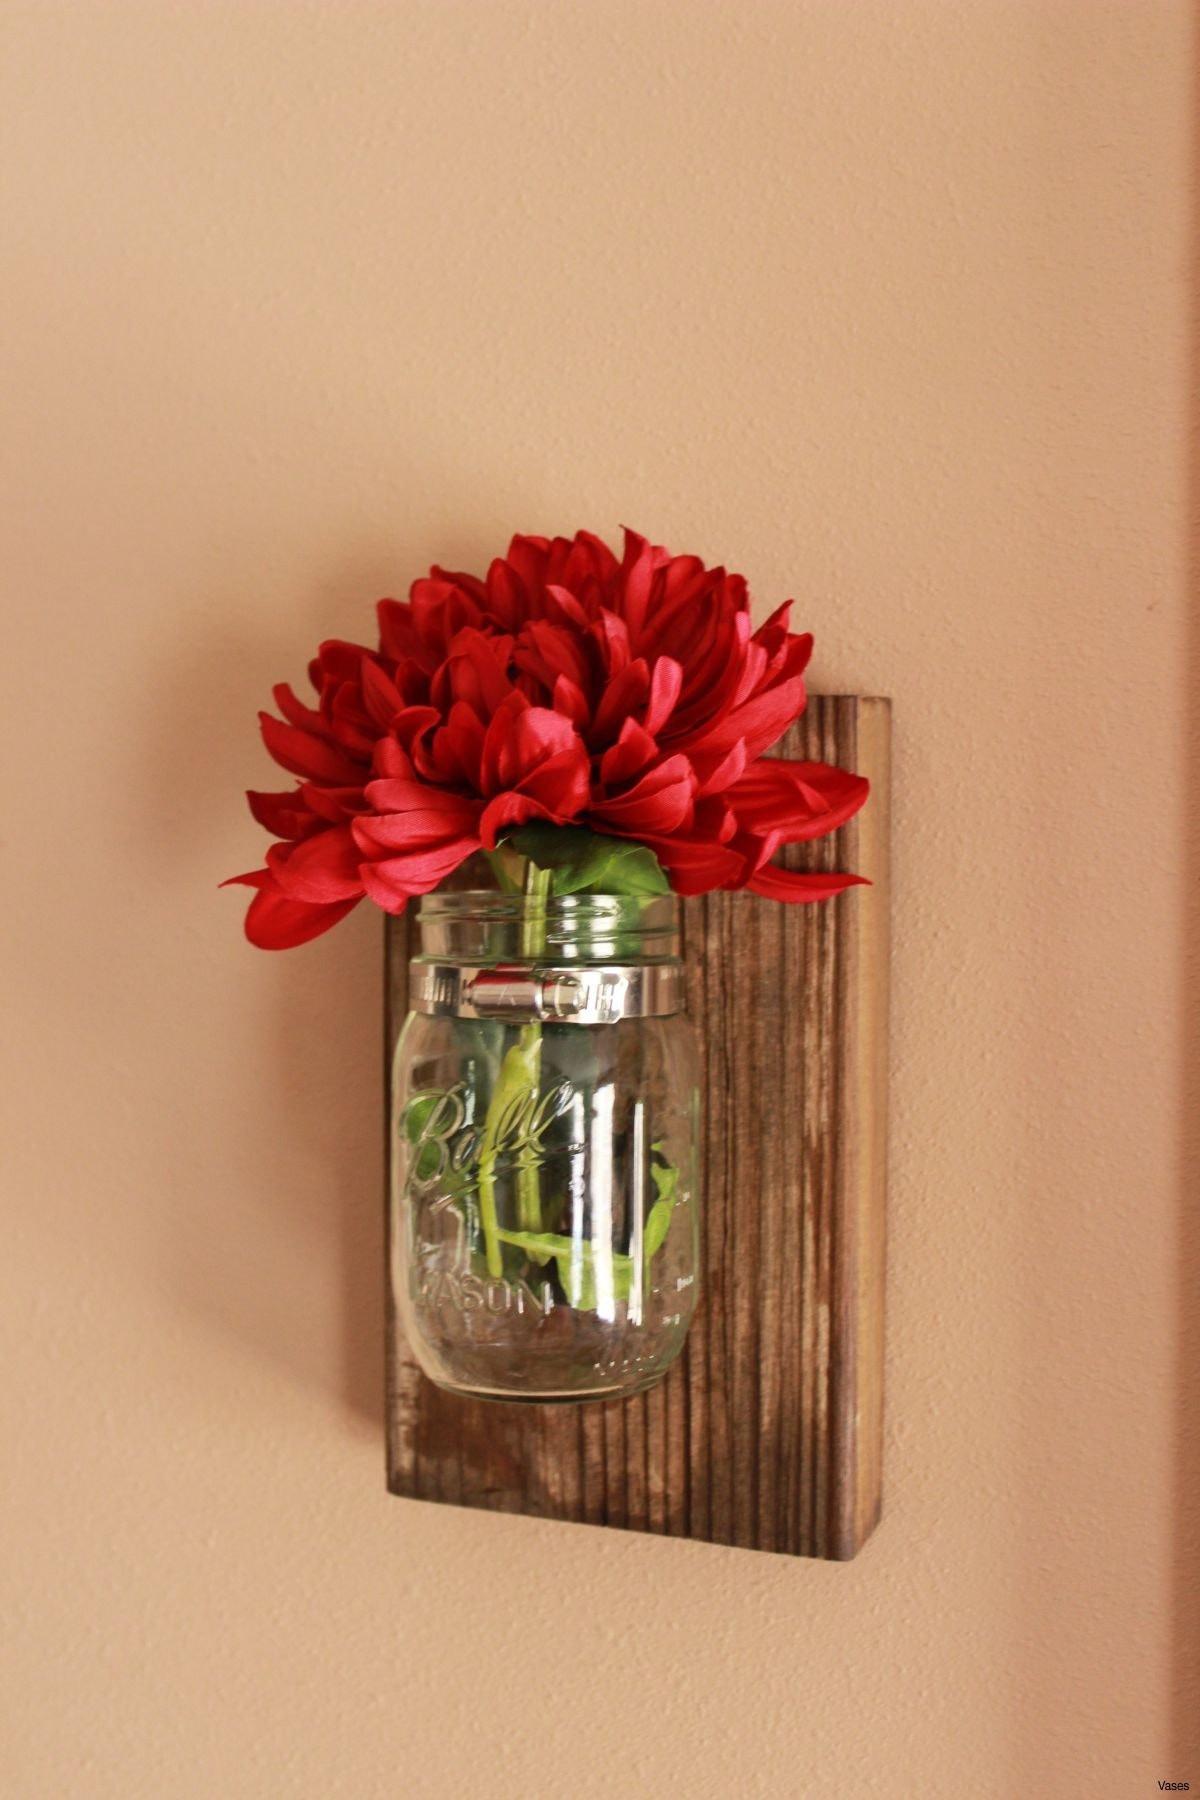 what size mason jar for vase of 10 new what to put in a large glass vase bogekompresorturkiye com within decorating ideas for vases elegant il fullxfull nny9h vases flower vase sconces zoomi 0d wall design